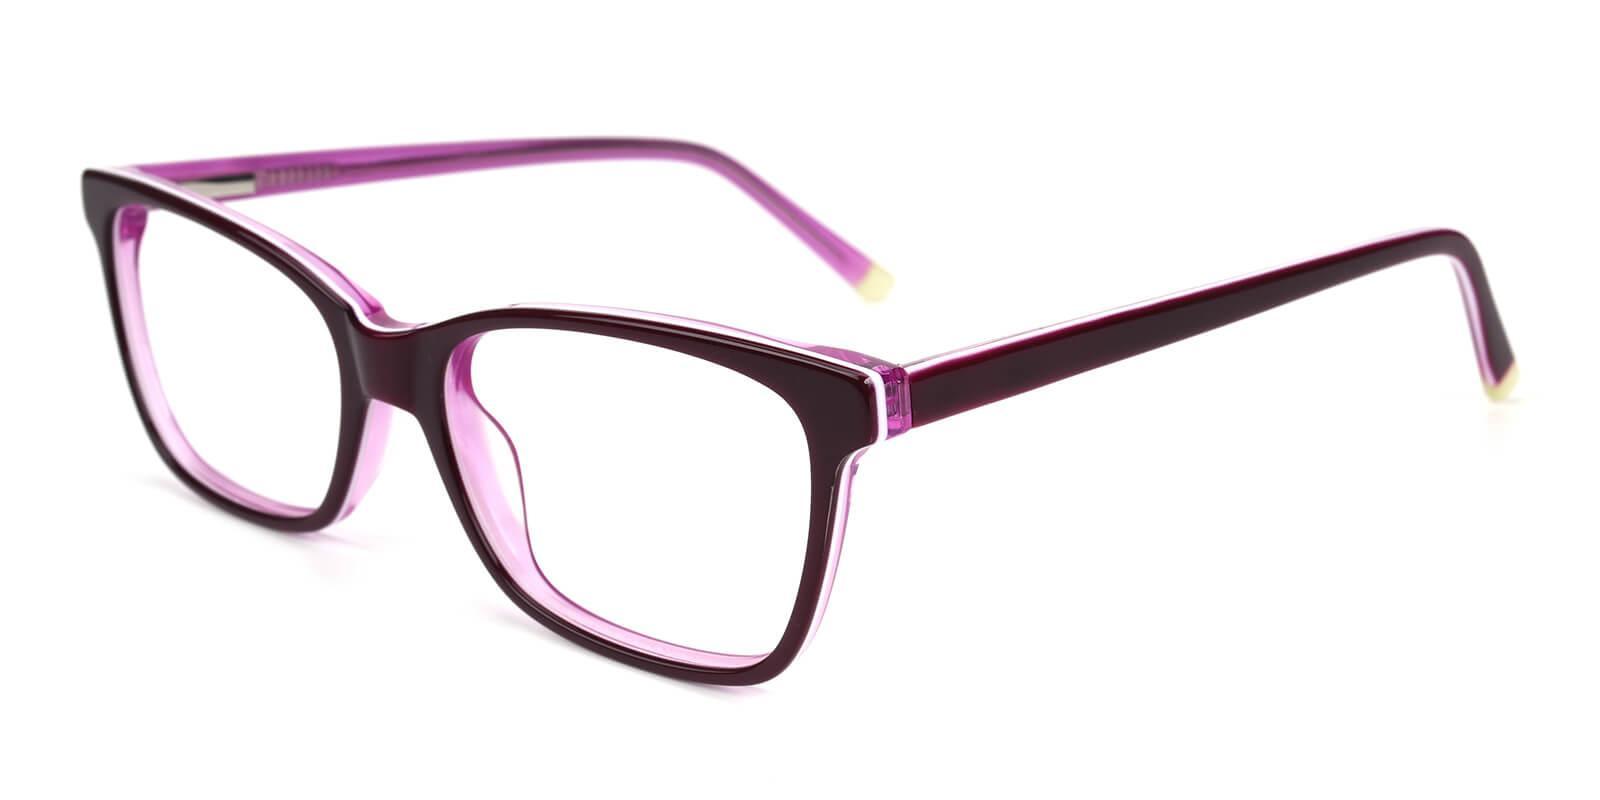 Waferay-Purple-Cat-Acetate-Eyeglasses-detail